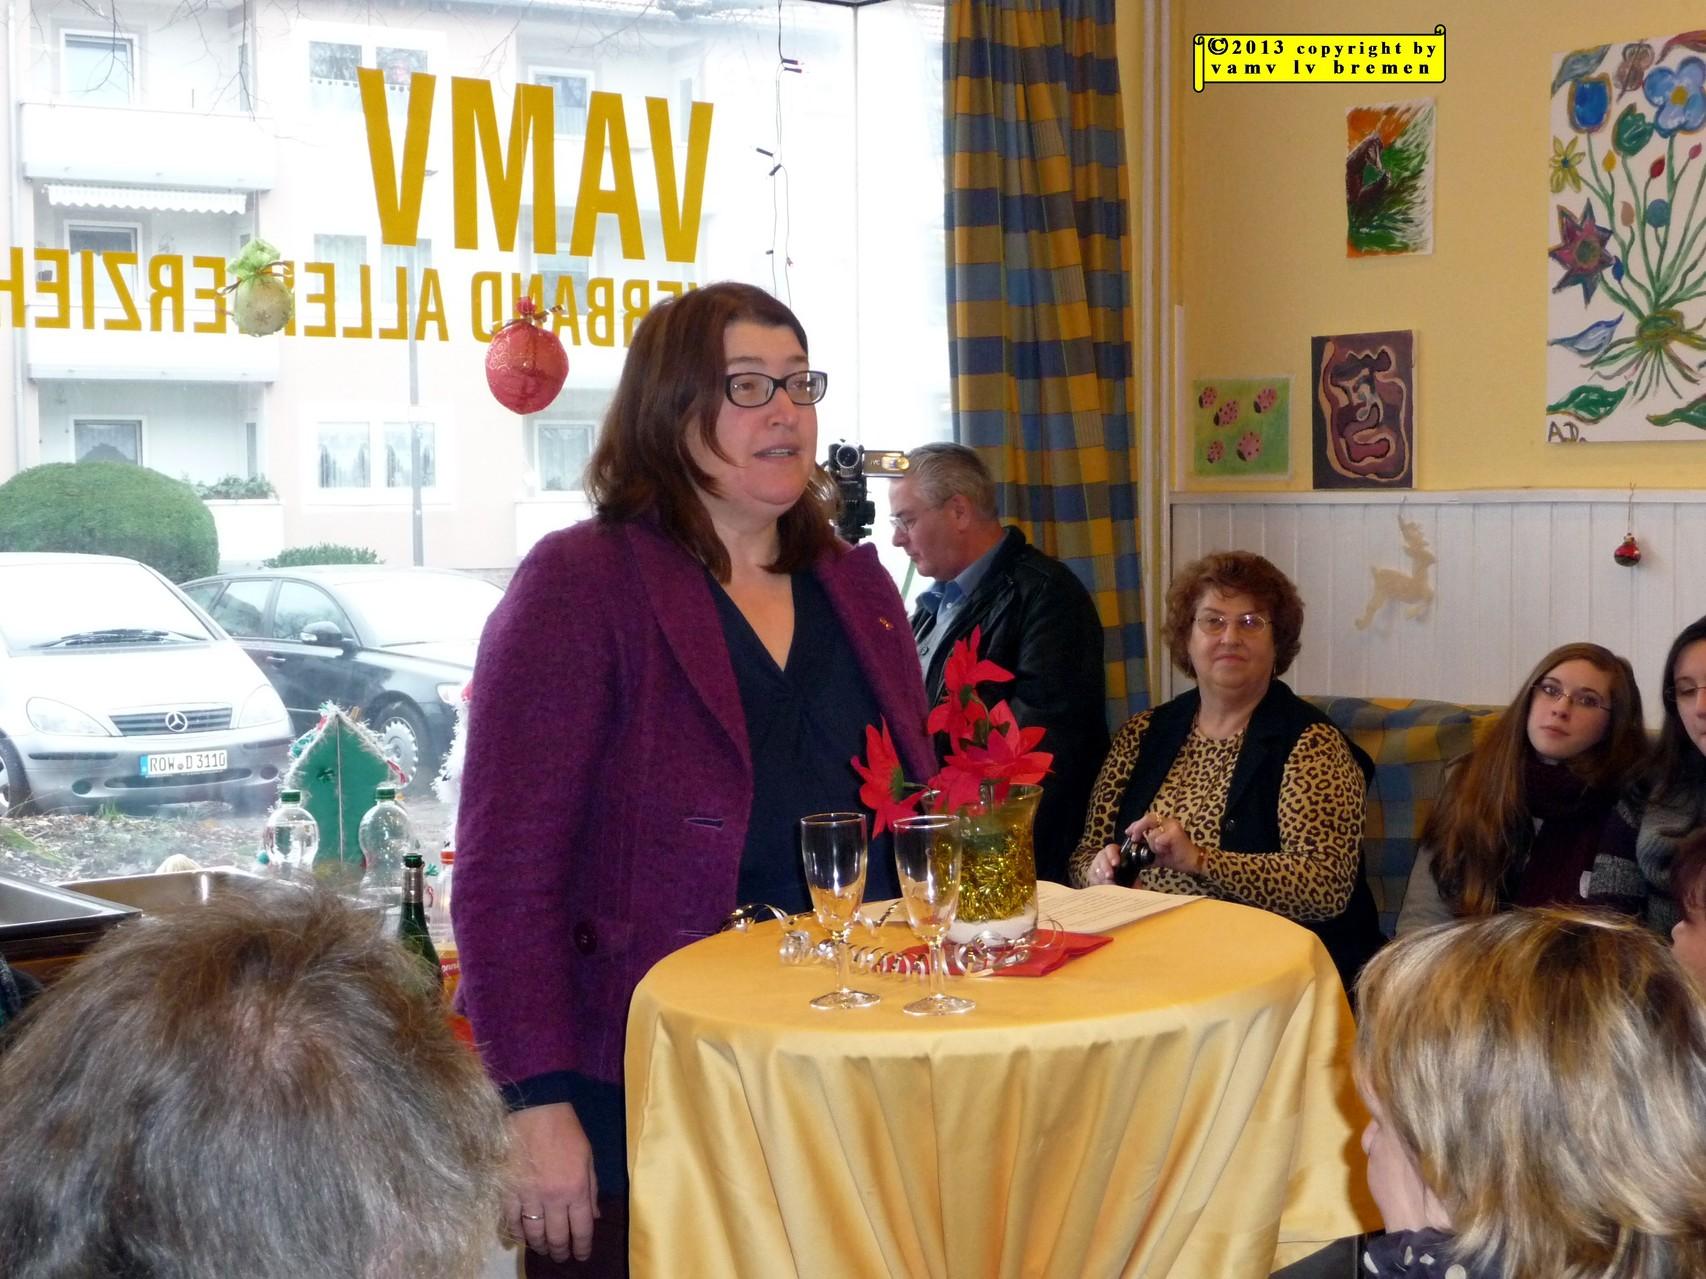 Feier für Gisela und jens e. Ansprache von Senatorin Frau Stahmann